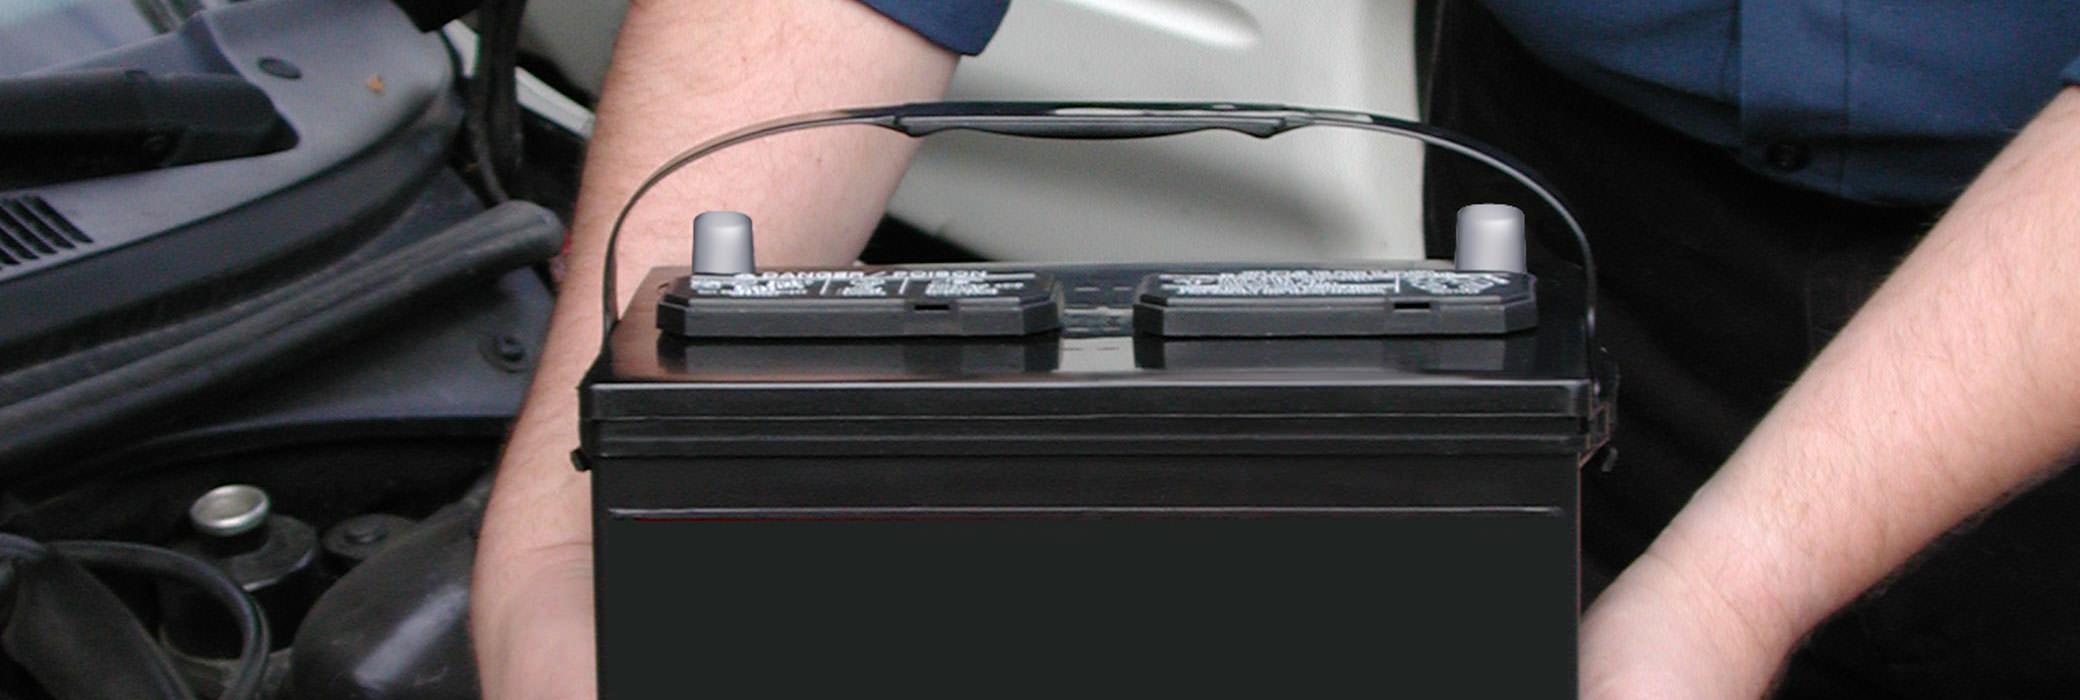 Installation | Install New Car Battery | Autobatteries com